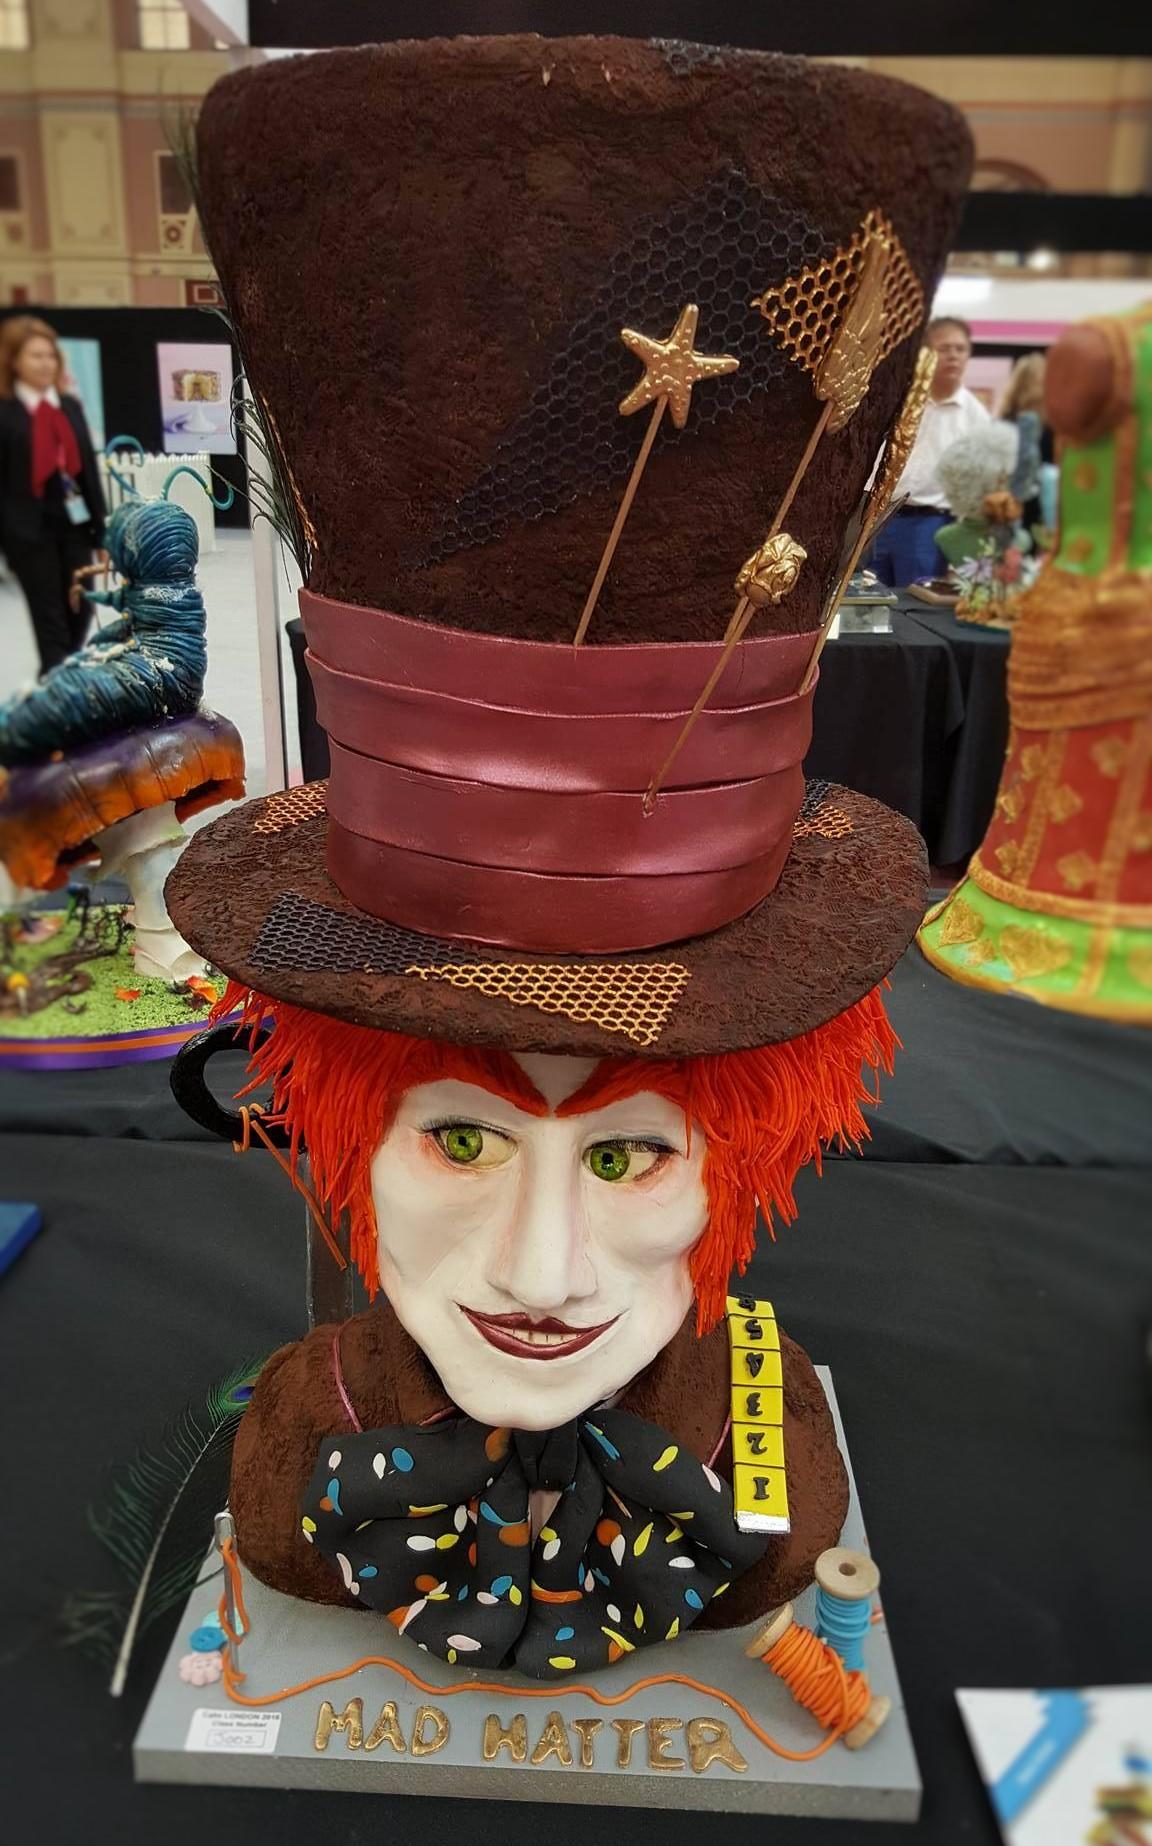 Wedding Cake Inspiration - Mad Hatter